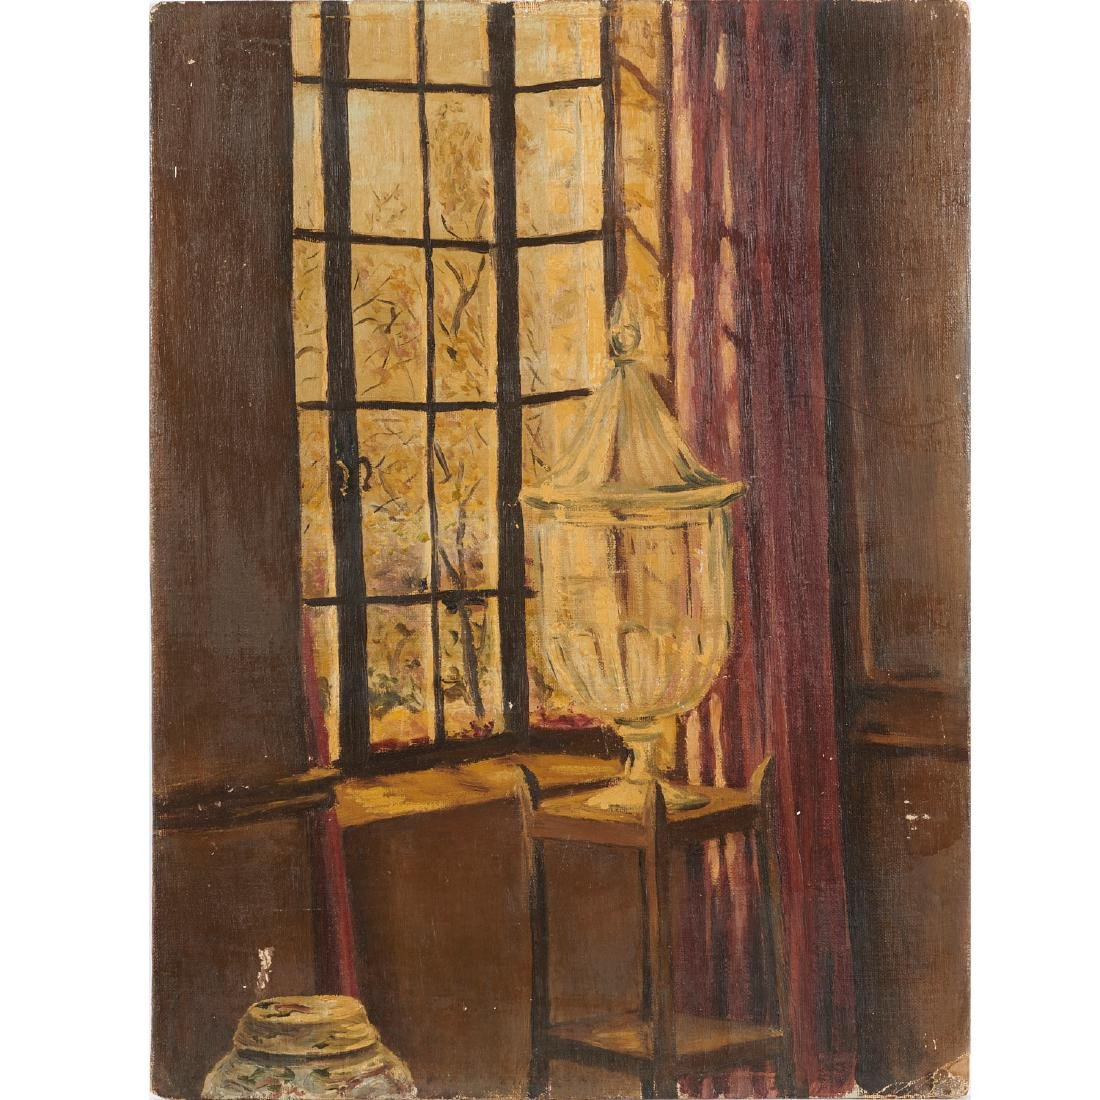 Fulco De Verdure, Still Life by Window, c. 1930s